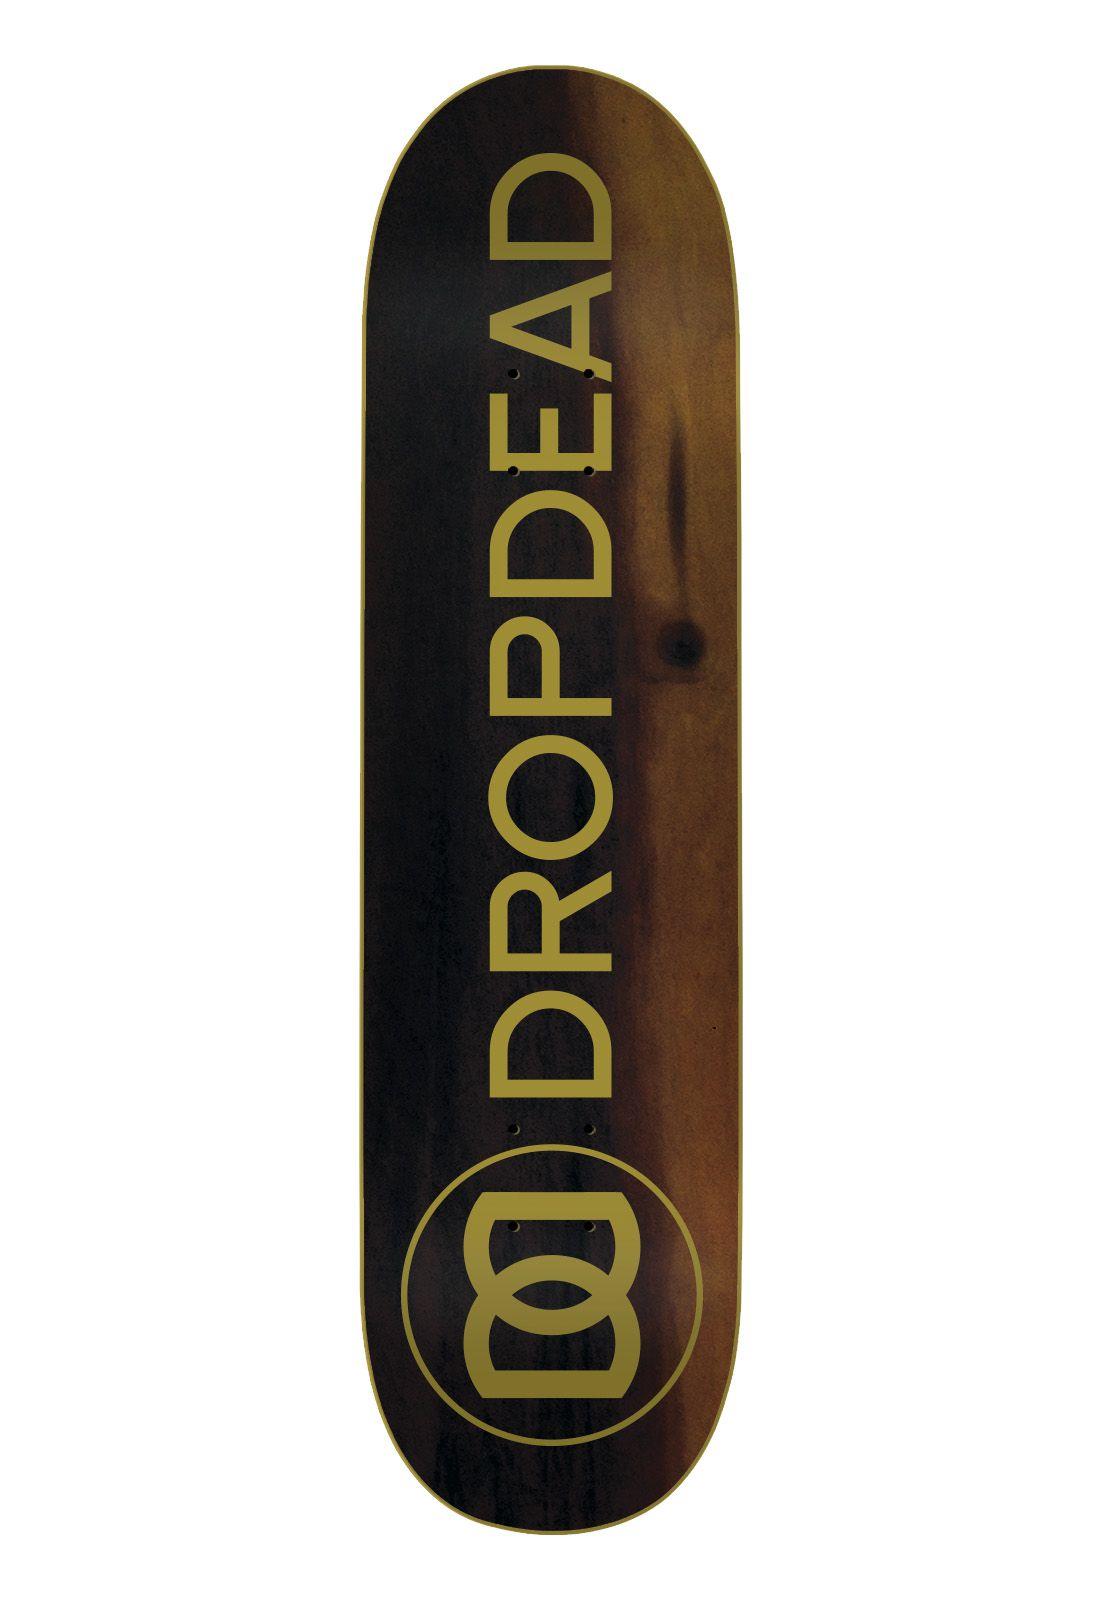 Skate Drop Dead Montado Completo Profissional Naked Gold Tone Stick FCR Black Sheep